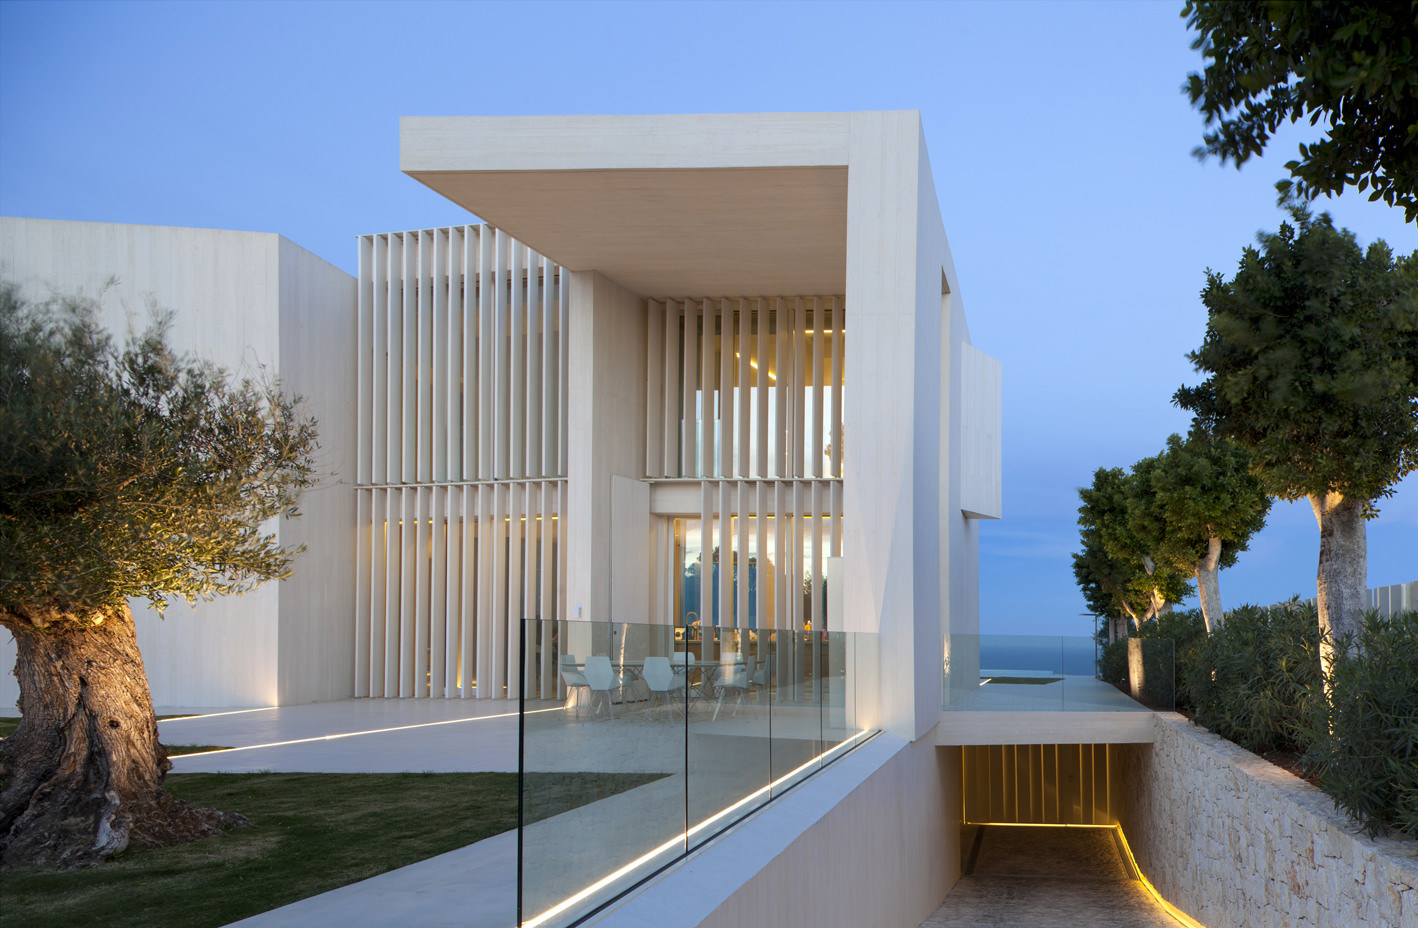 casa-sardinera-javea-alicante-ramon-esteve-design-architecture-effronte-07